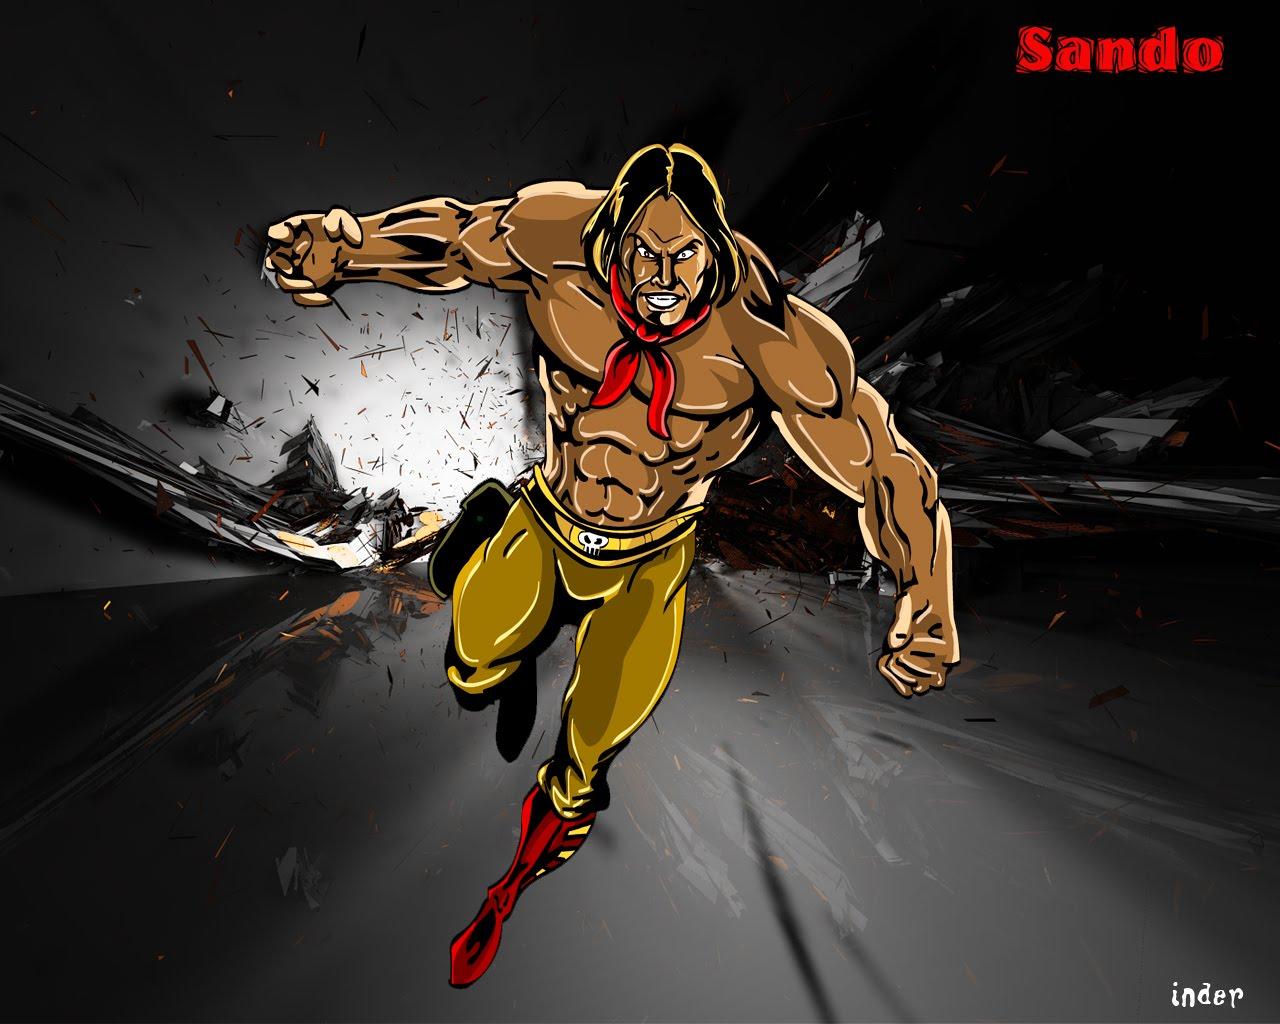 Photoshop work superhero wallpapers - Superhero background wallpaper ...